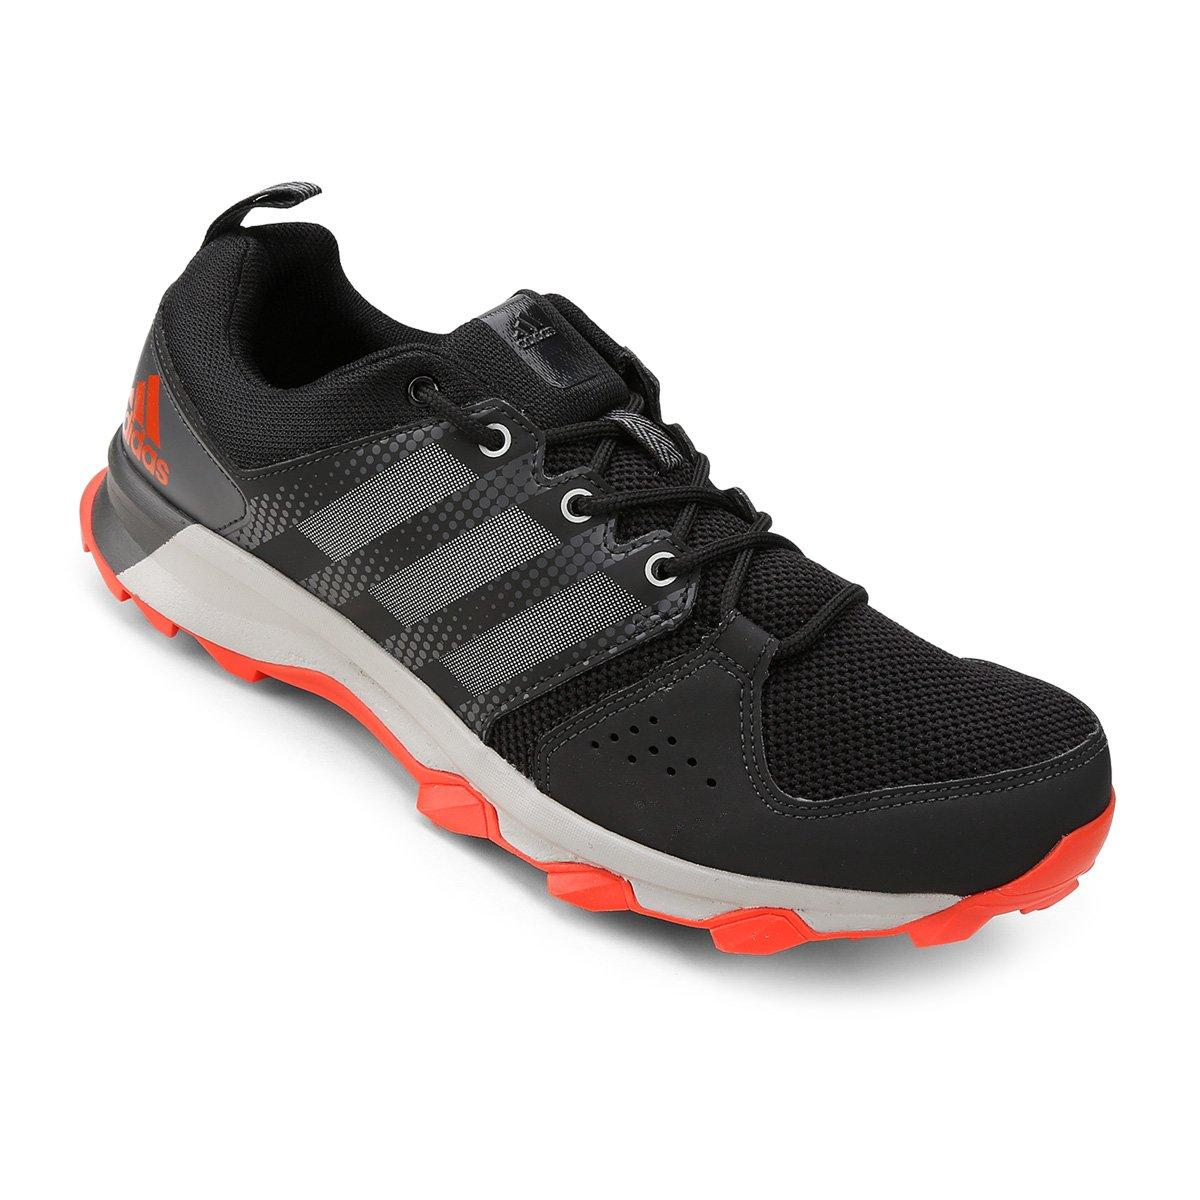 d649ad04cc6bc Tênis Adidas Galaxy Trail Masculino | Netshoes